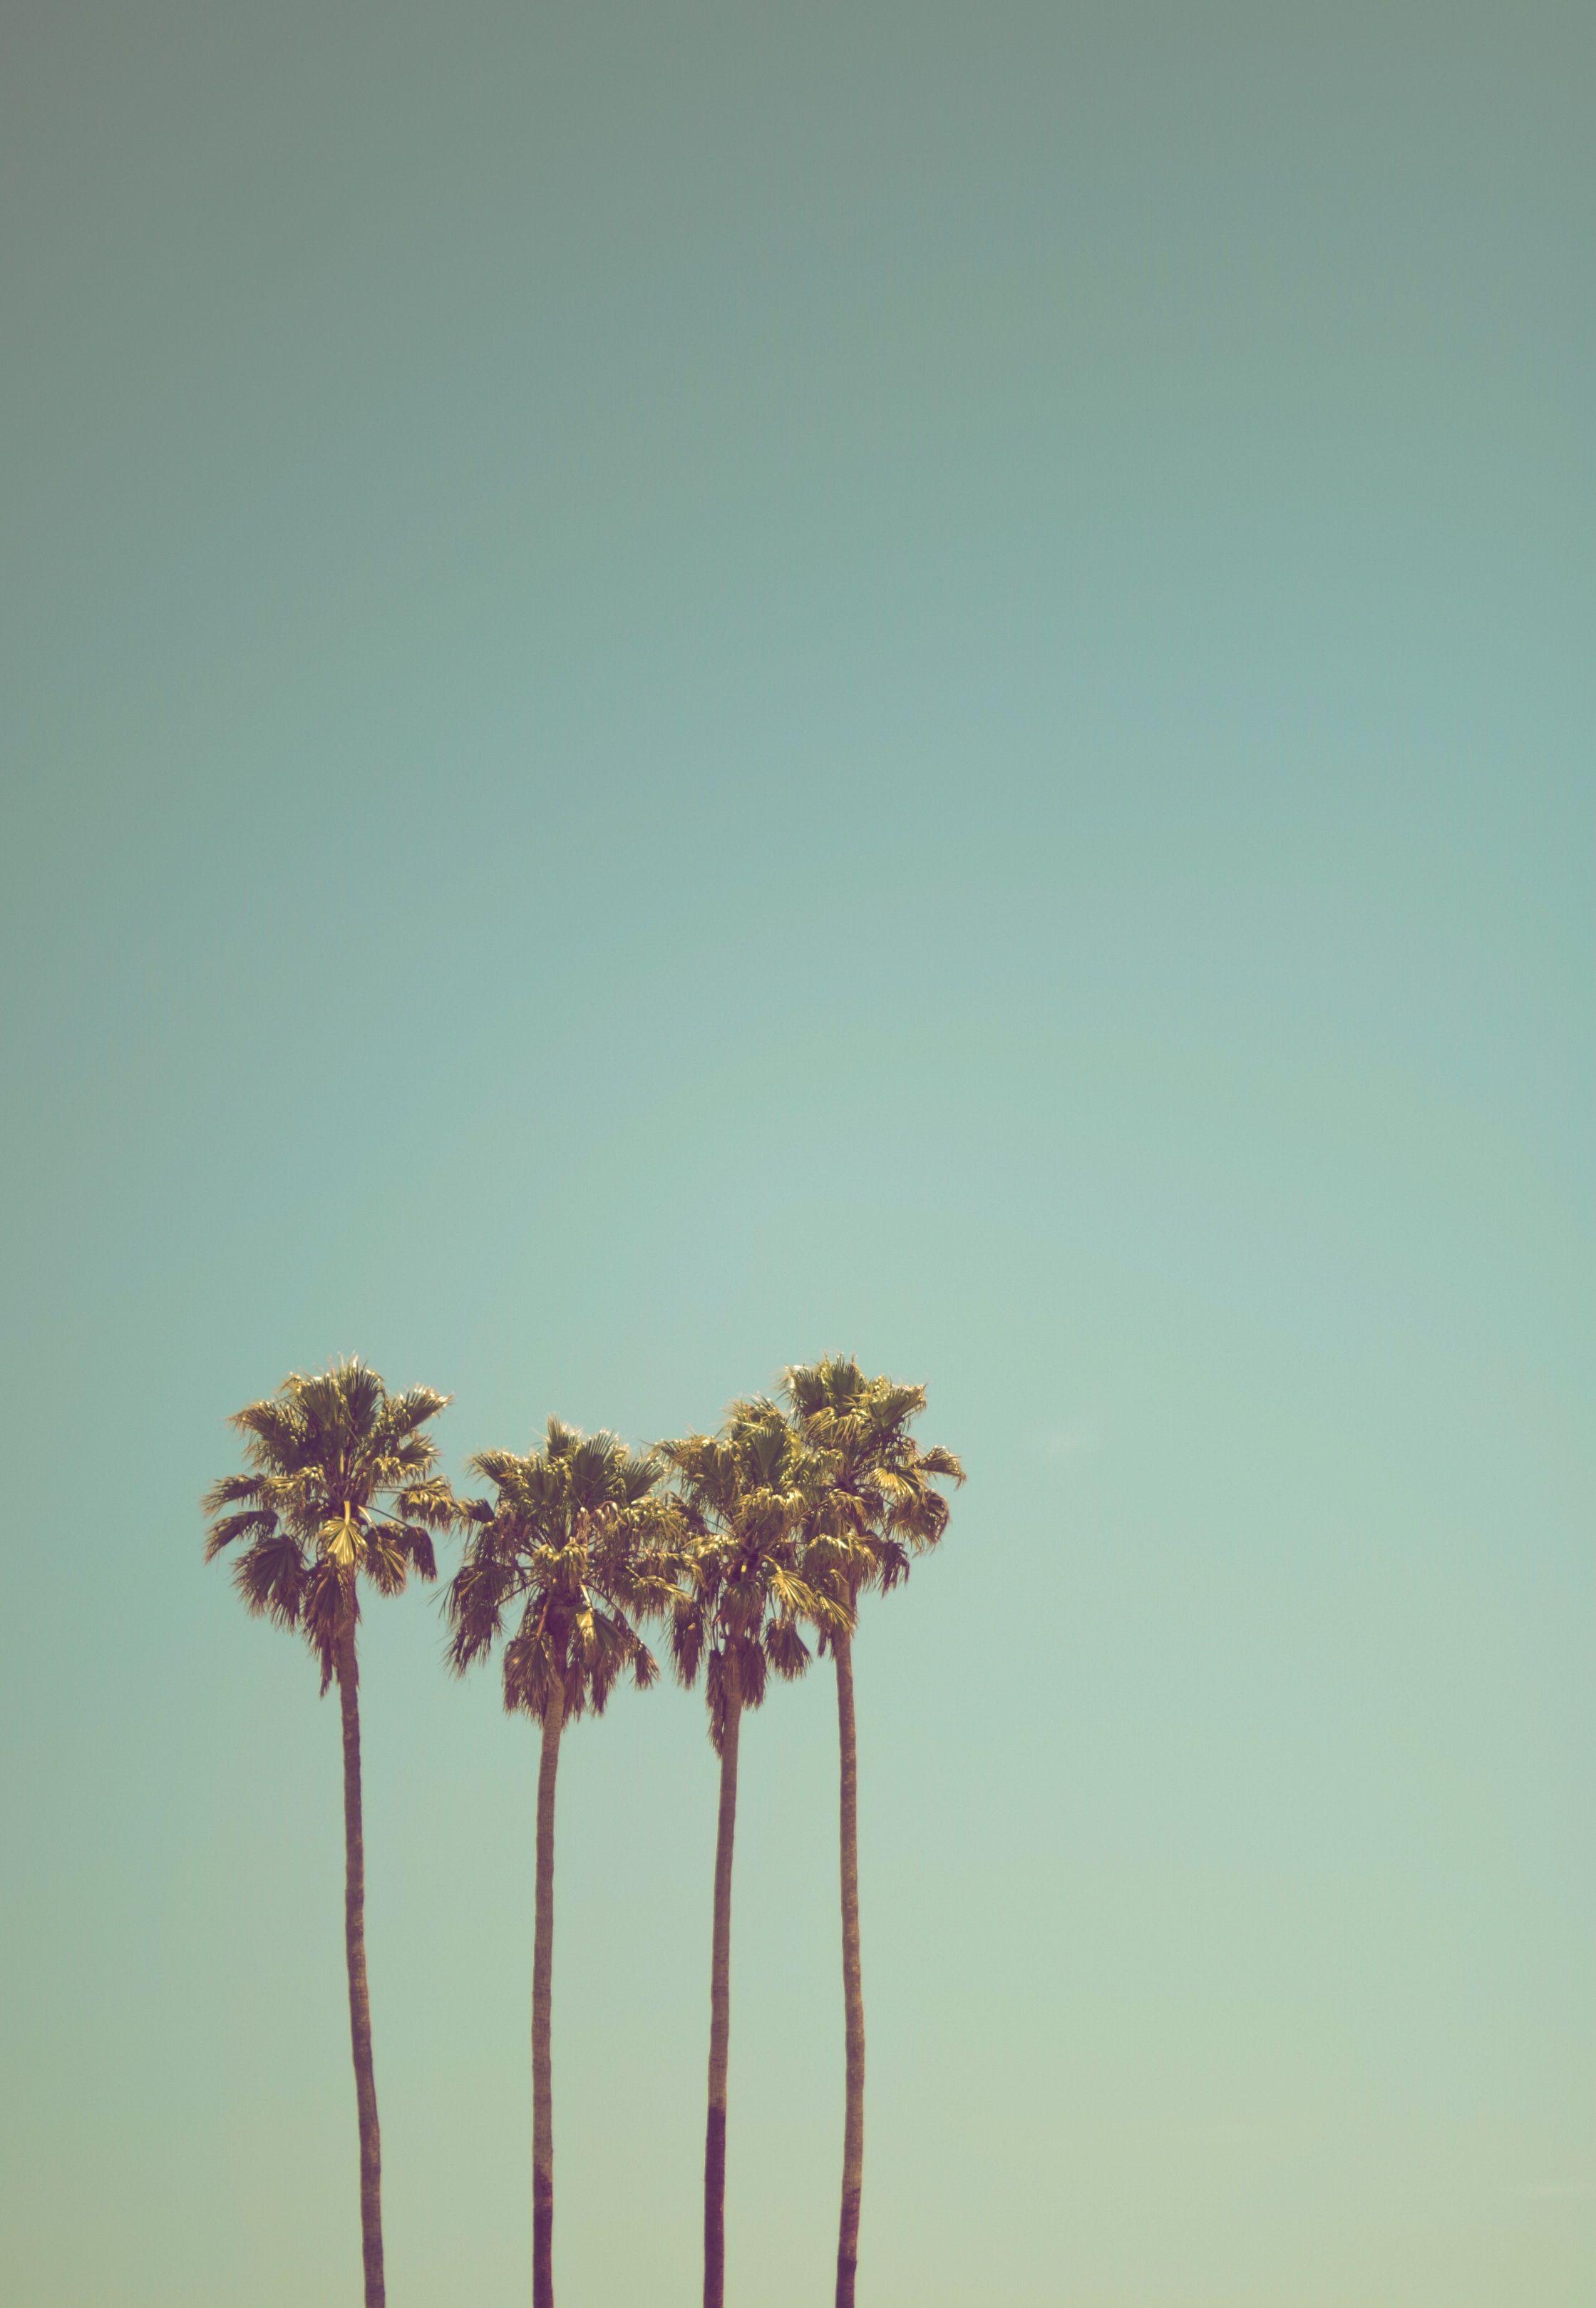 Summer Backdrop Seaside Coconut Tree Backdrops Tropical